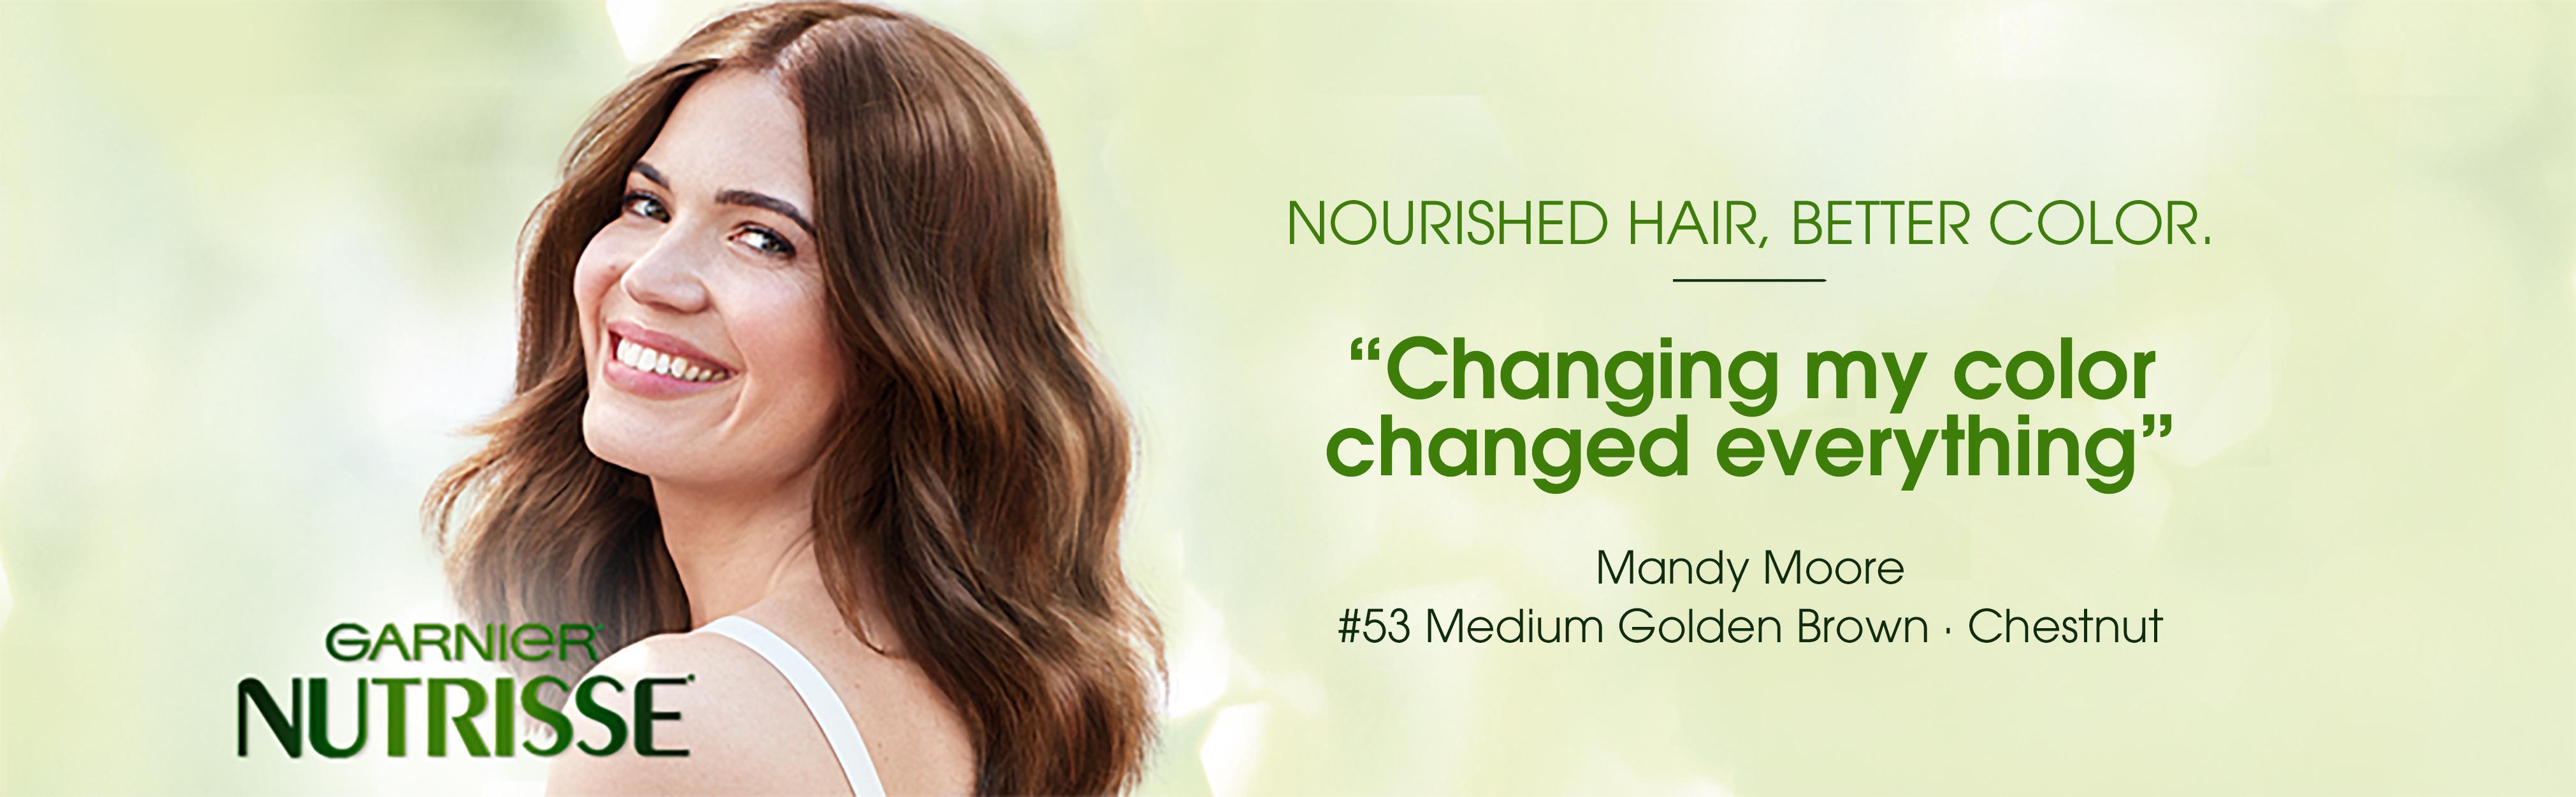 Amazon.com: Garnier Nutrisse Hair Color #69 Intense Auburn (Pack of ...